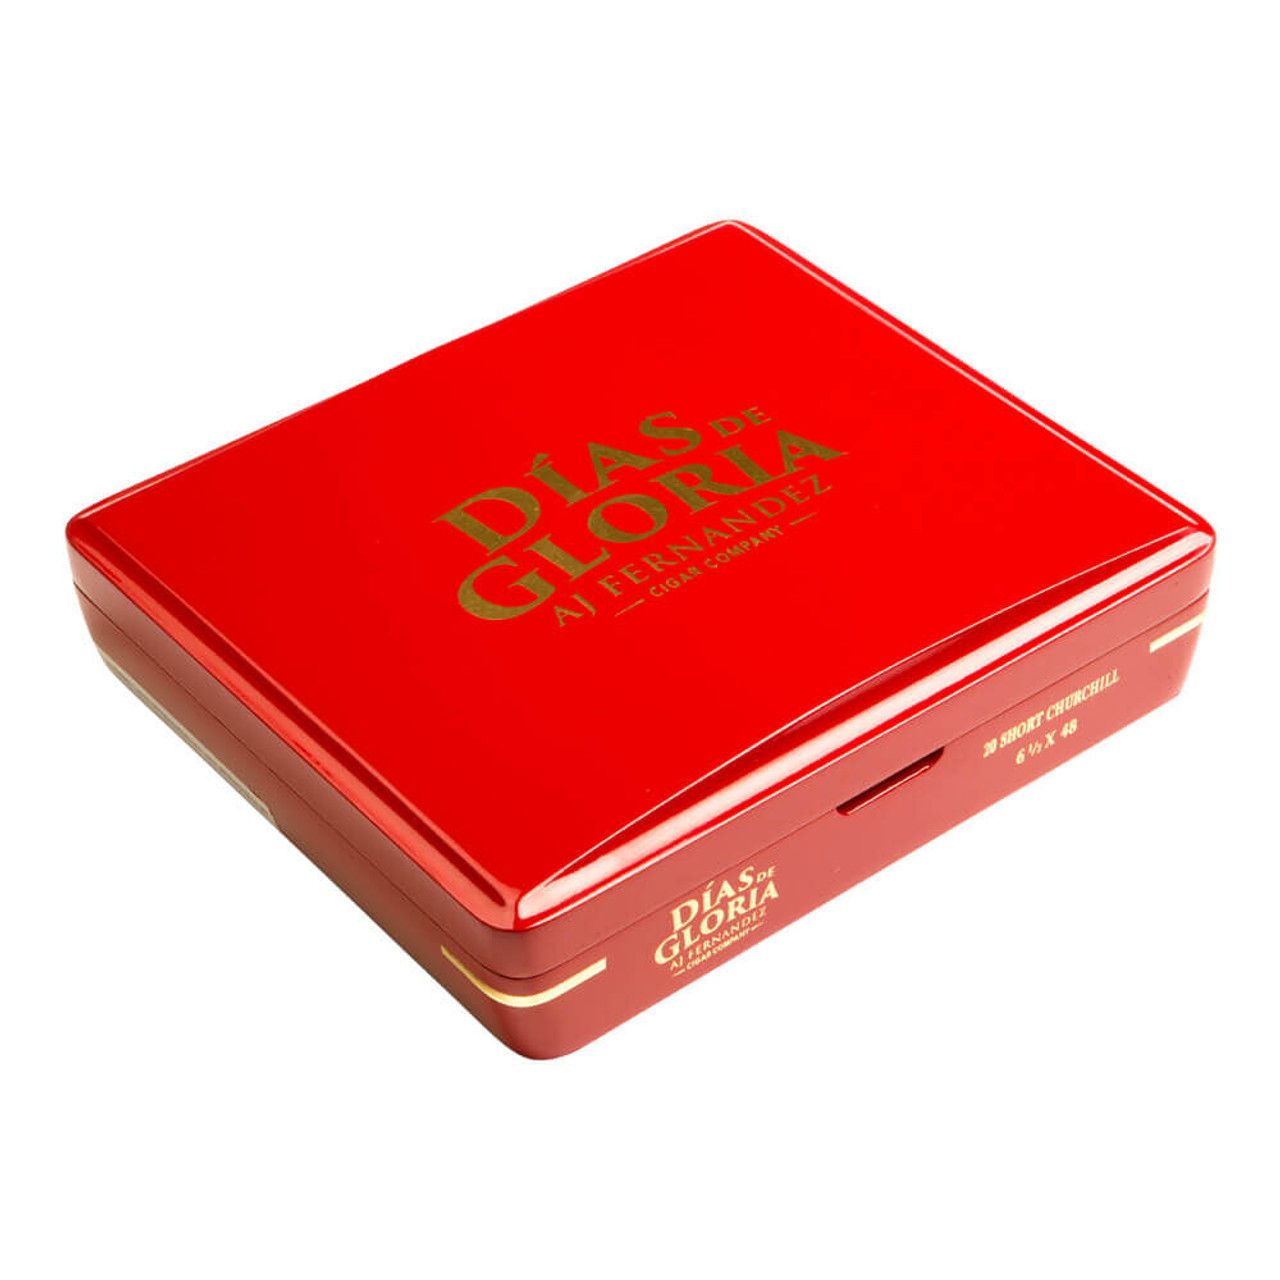 AJ Fernandez Dias de Gloria Short Churchill Cigars - 6.5 x 48 (Box of 20)